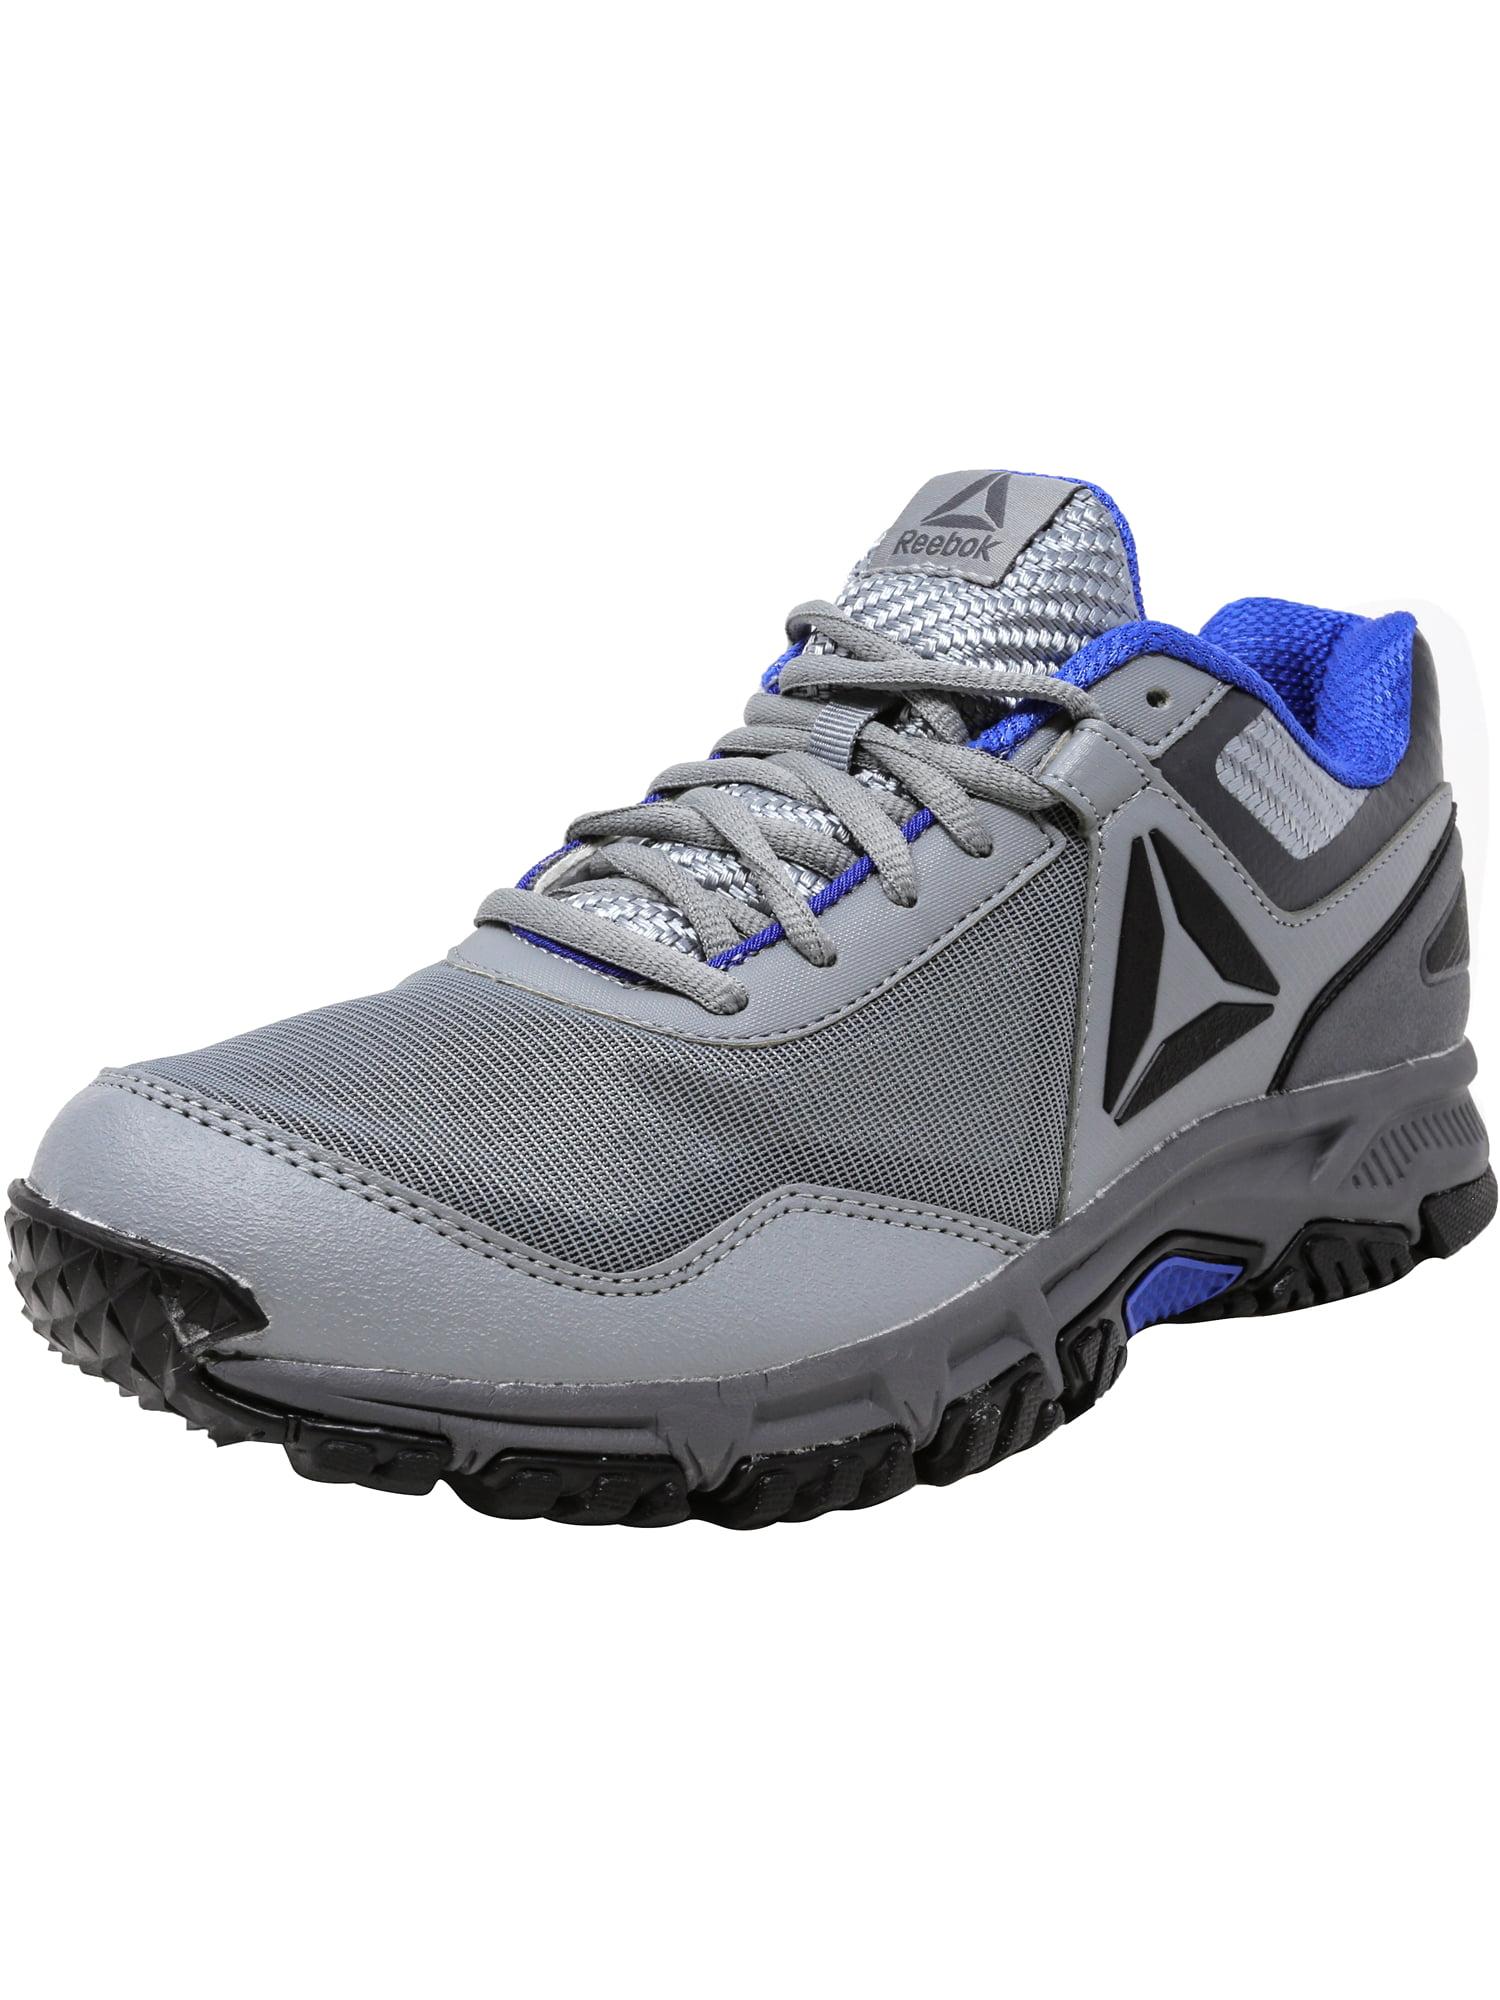 Reebok Men's Ridgerider Trail 3.0 Grey